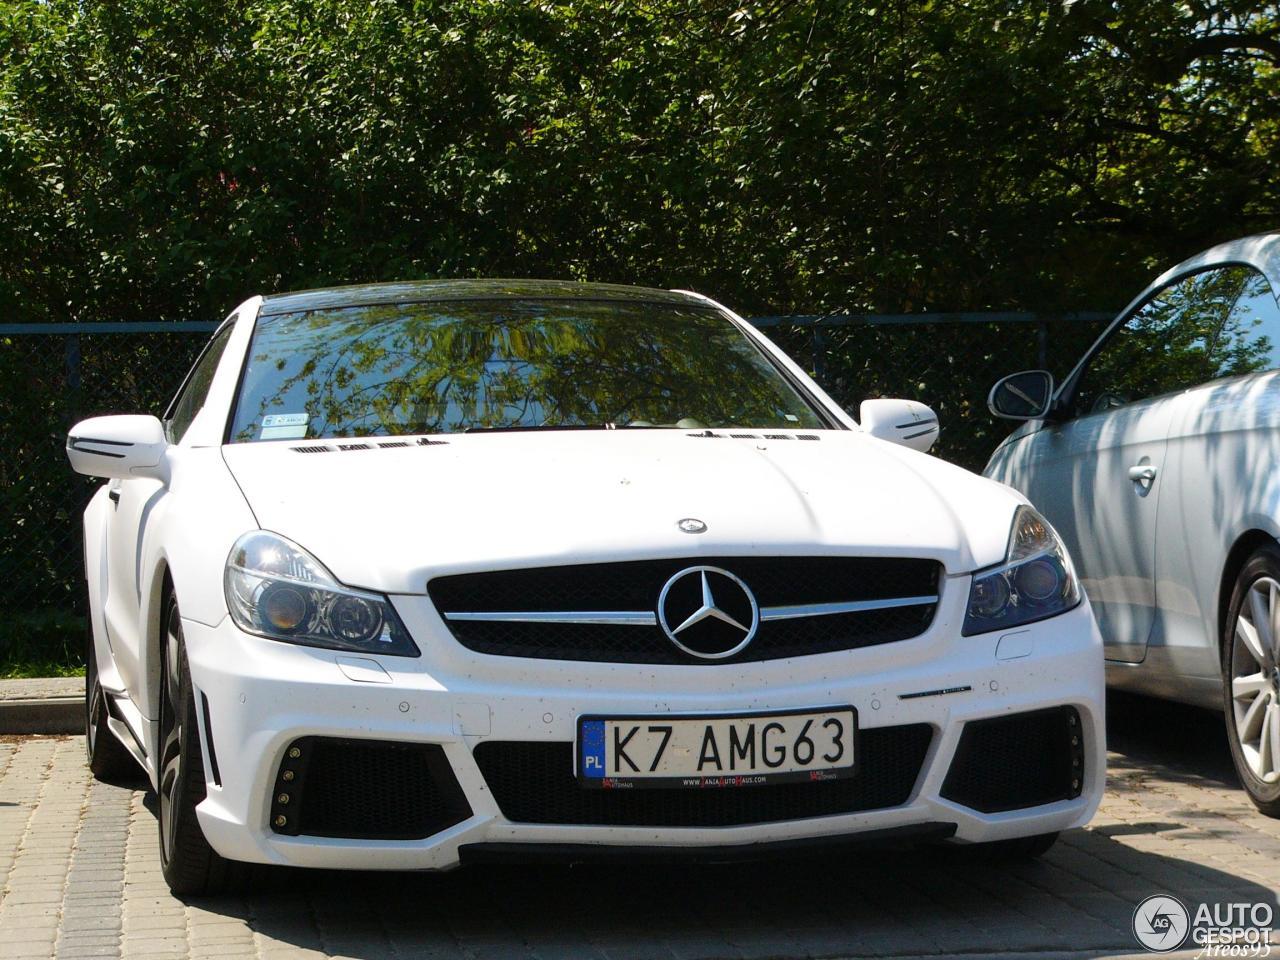 Mercedes benz wald sl 63 amg r230 black bison edition 22 for Mercedes benz black edition